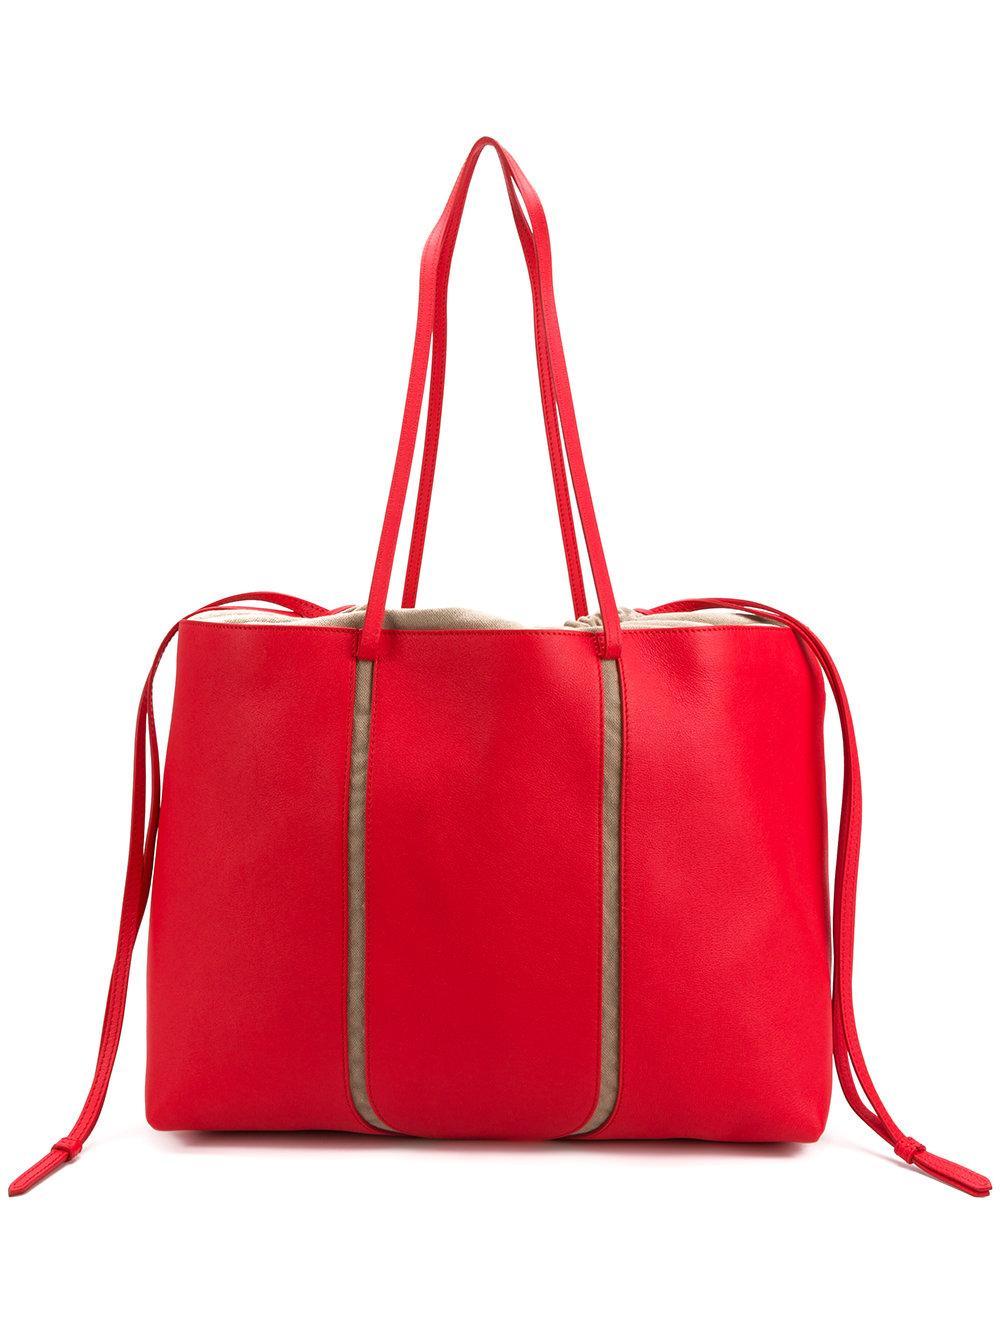 e538efe121bc2 Maison Margiela Leather Convertible Tote Bag - Red